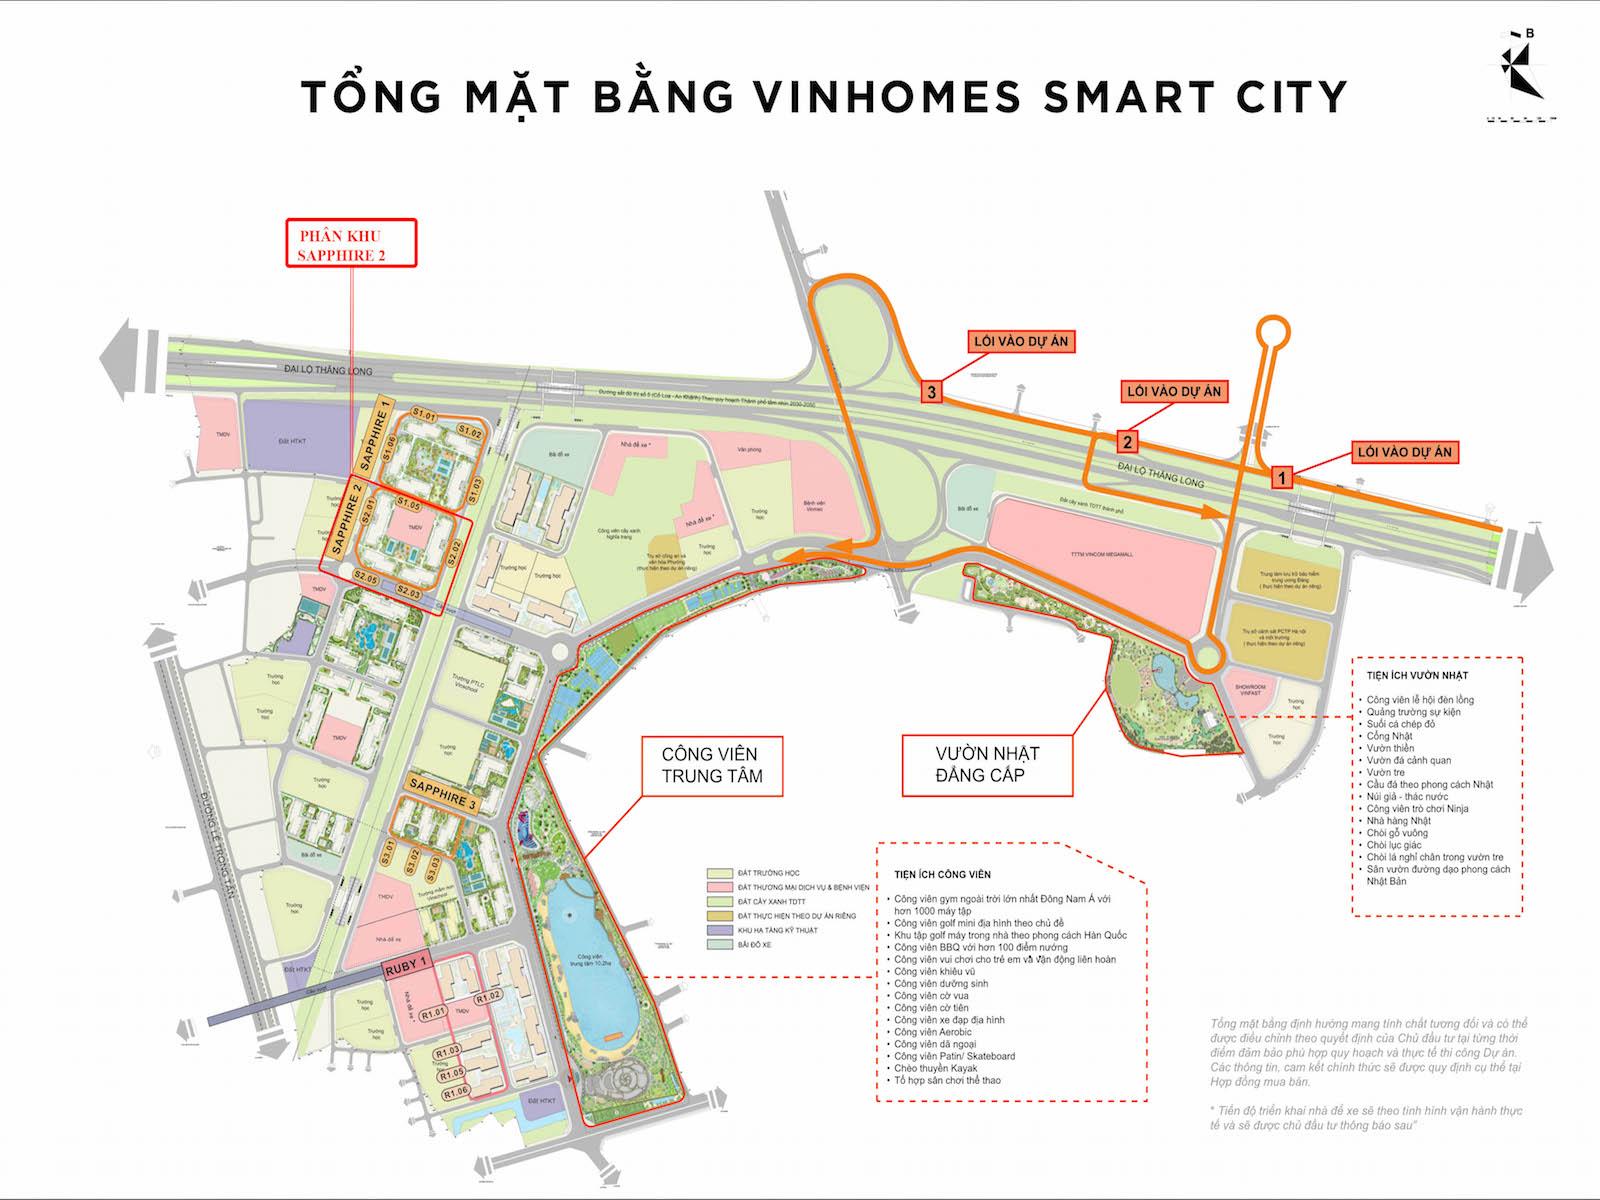 hinh anh vi tri Sapphire 2 Vinhomes Smart City so 1